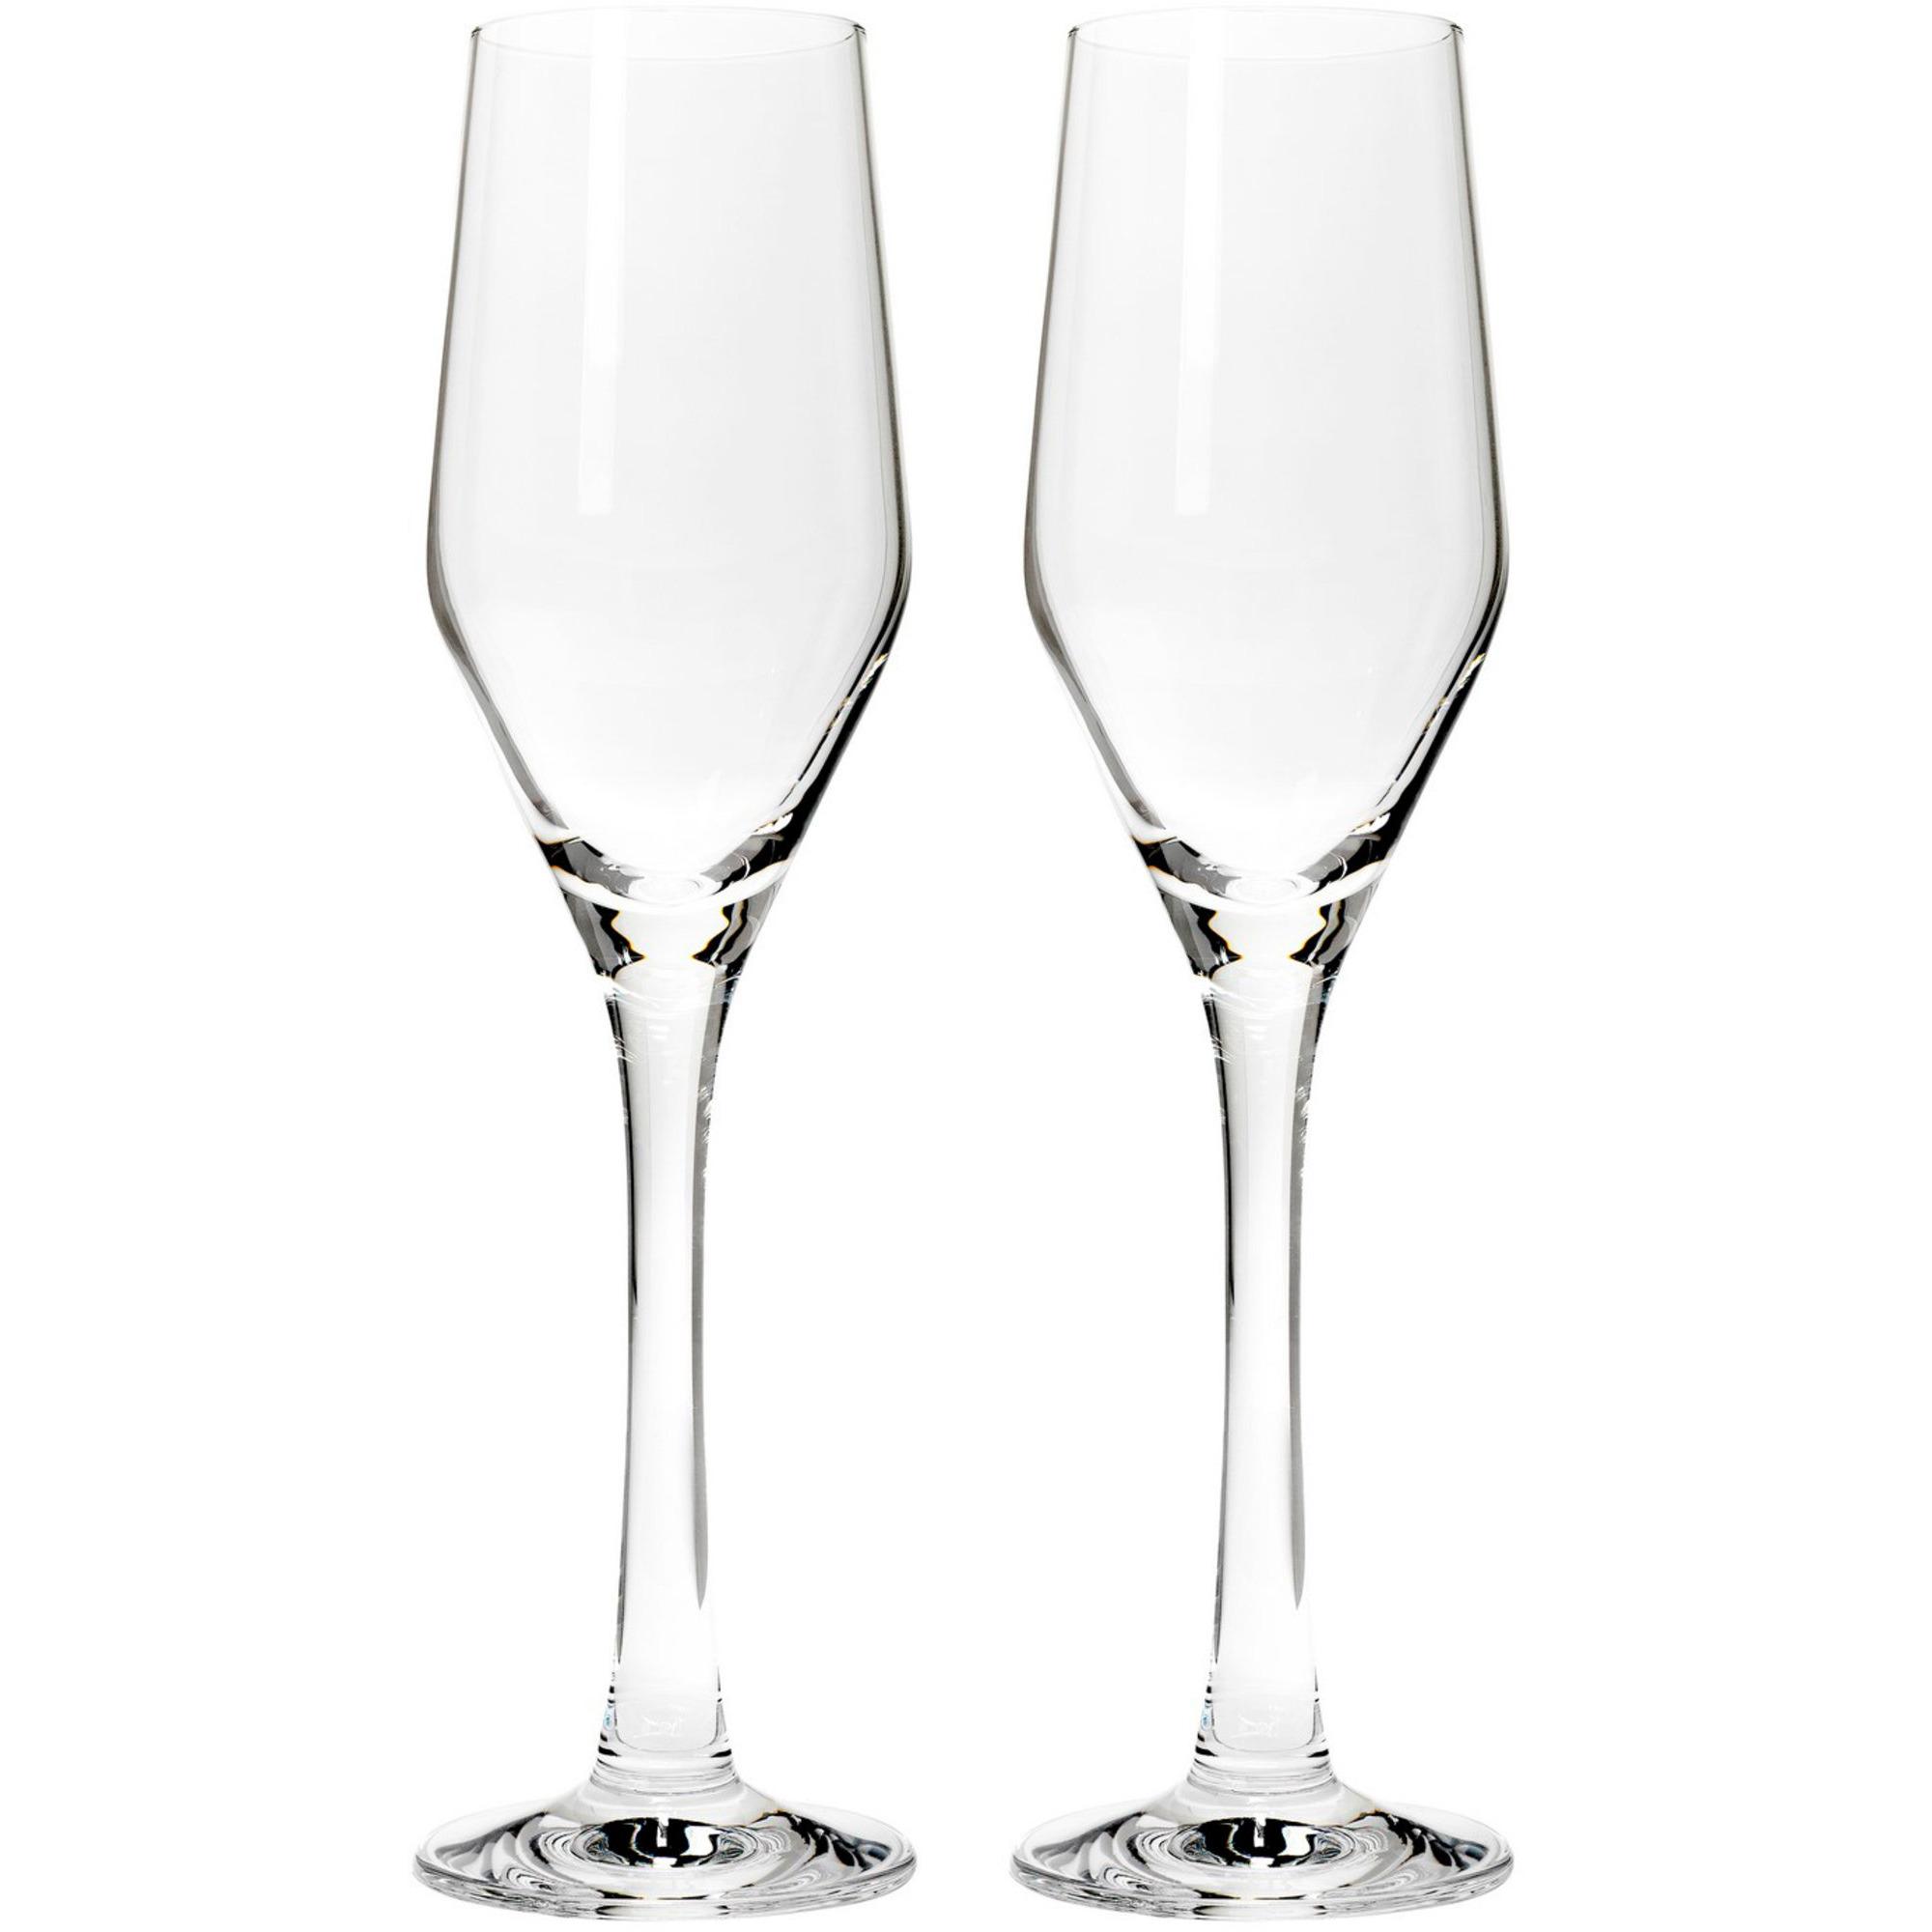 Frederik Bagger Signature Champagneglas 2 st.